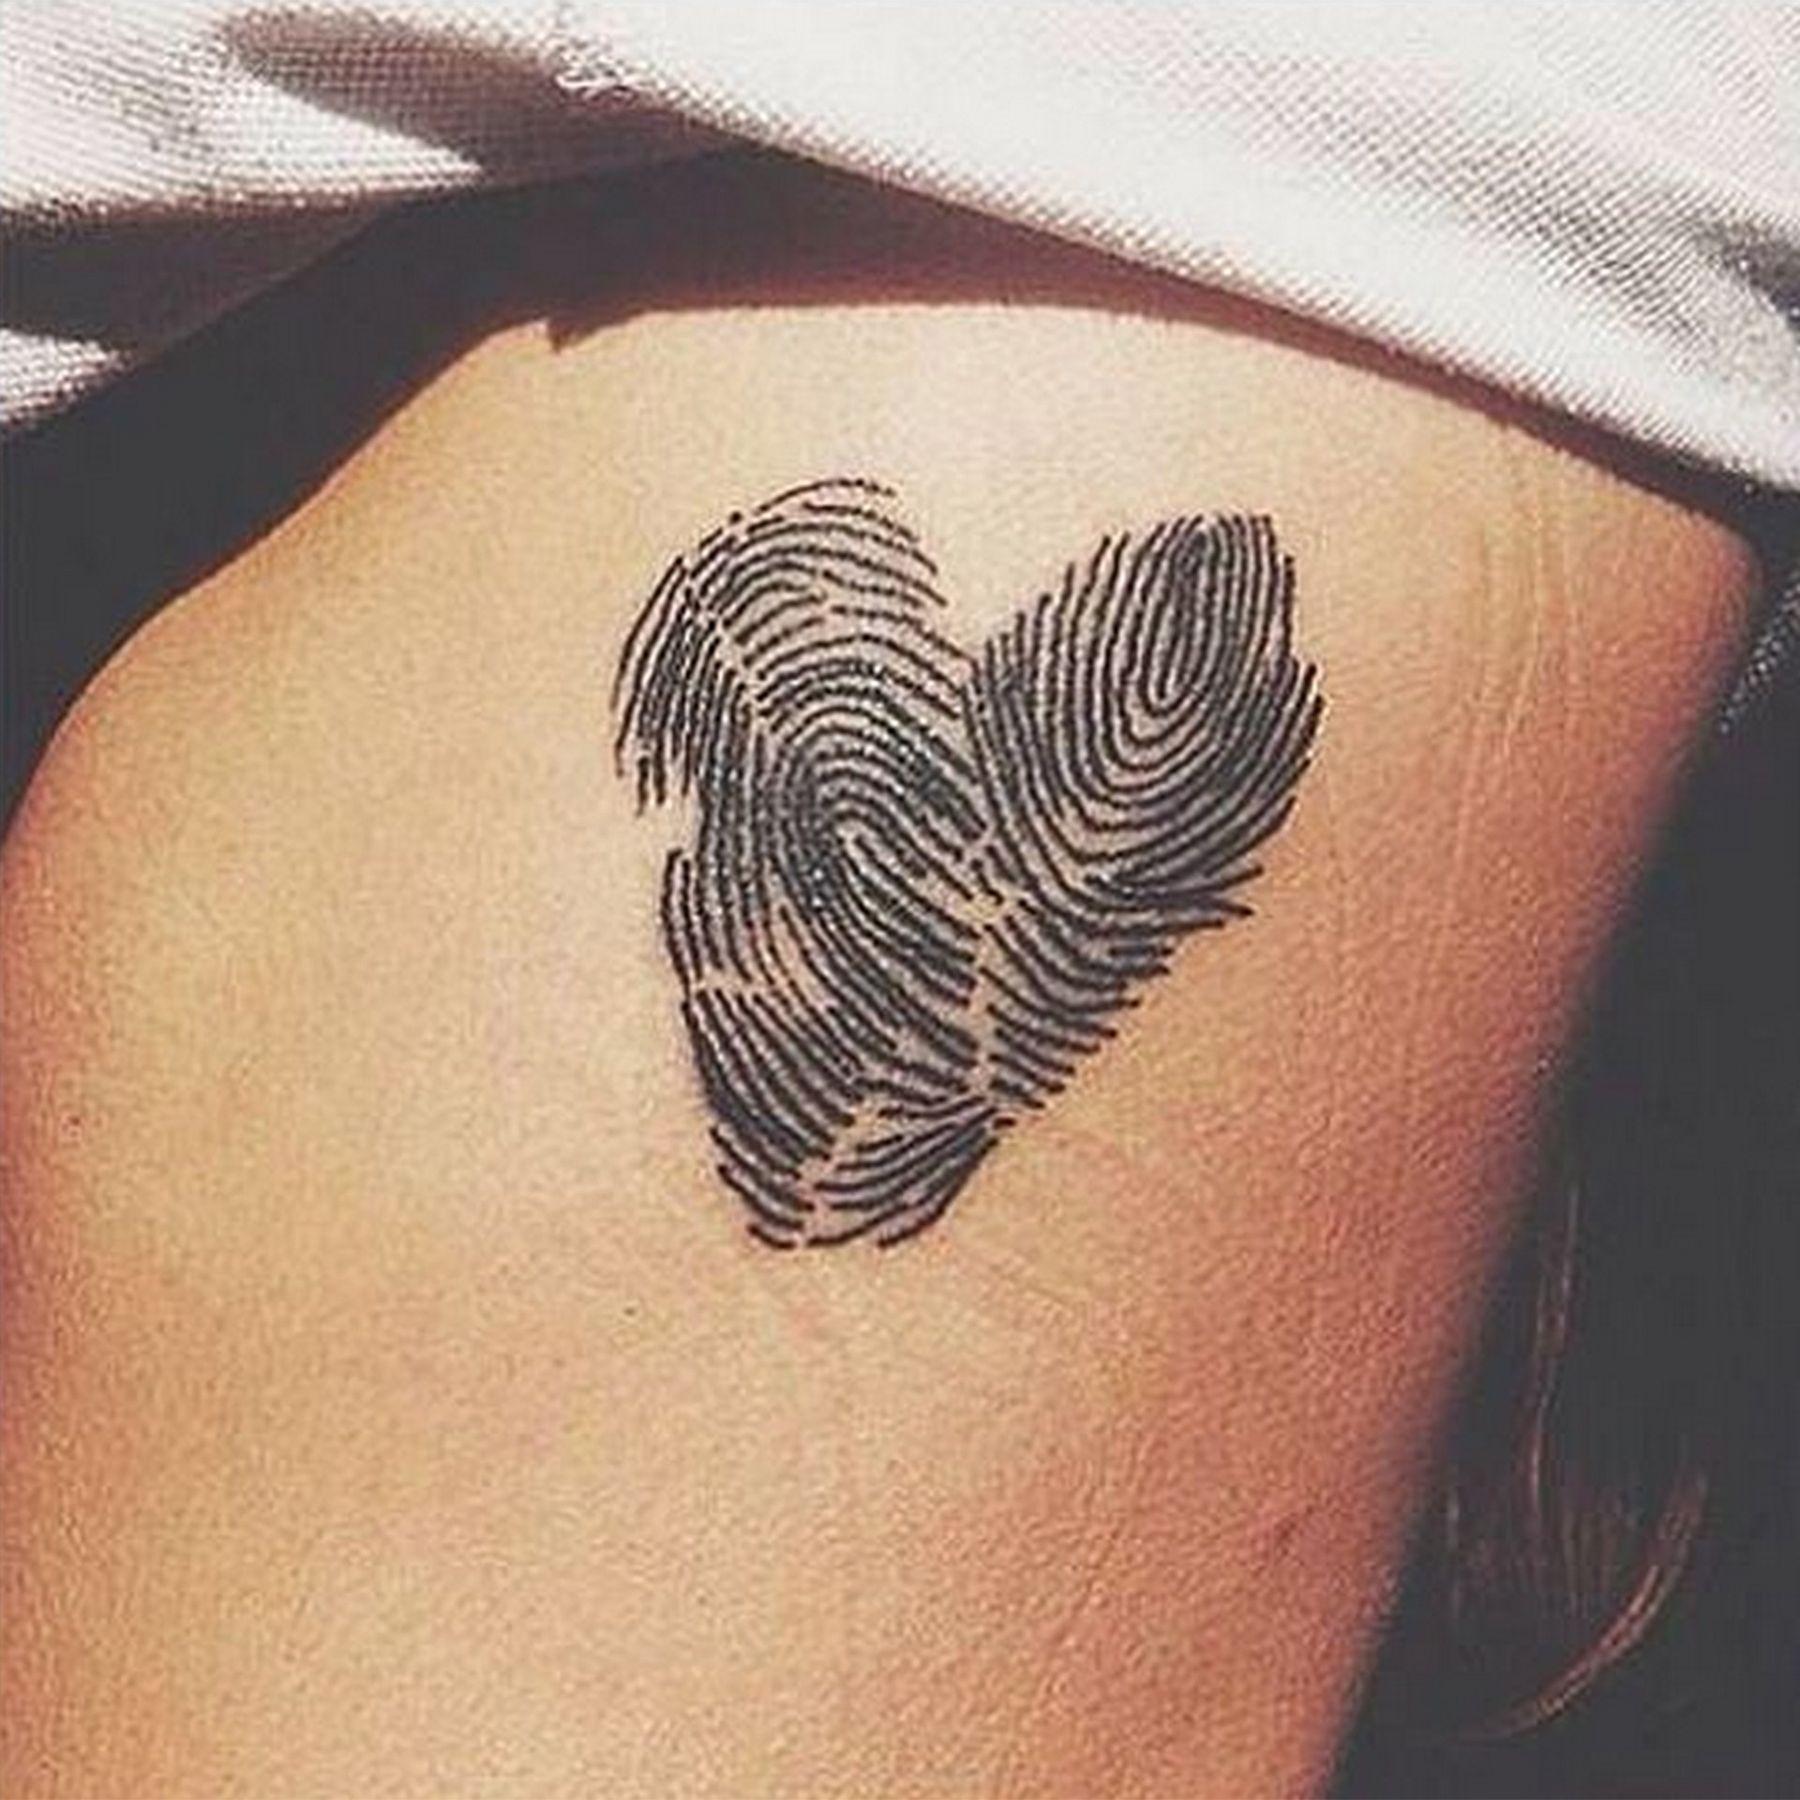 Name tattoo good idea mandalas tropical prints and tiny tattoo designs are set to be the